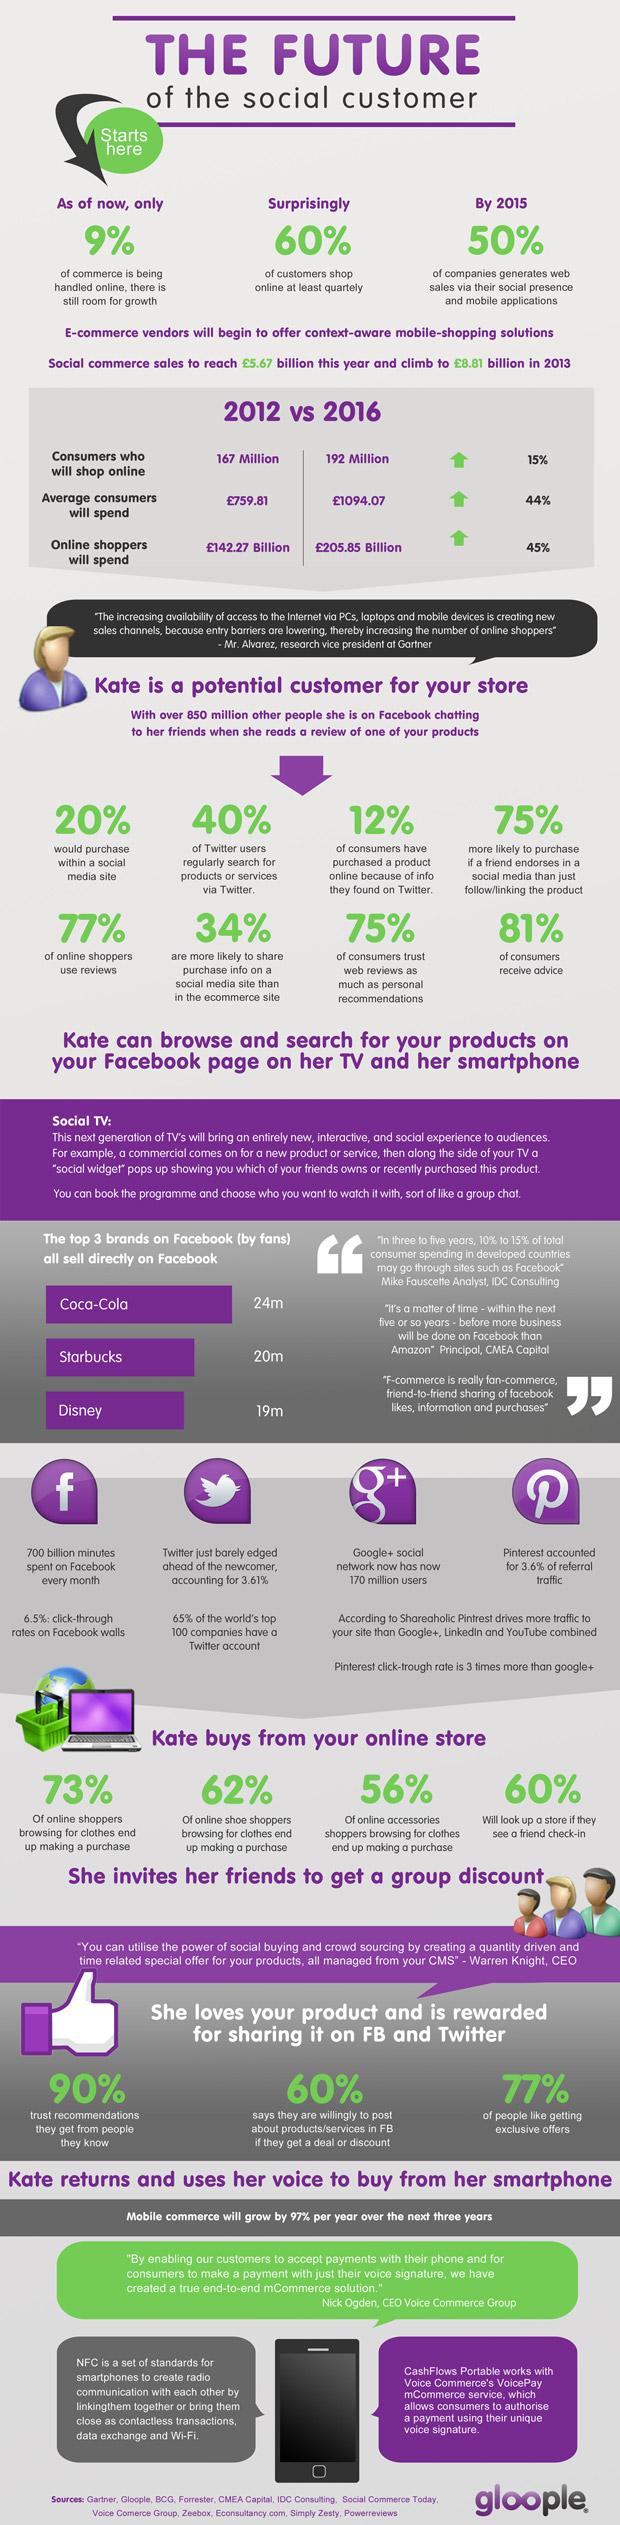 Social Media Influence on Customers in the Future via/ @SavvyPanda #SocialCommerce